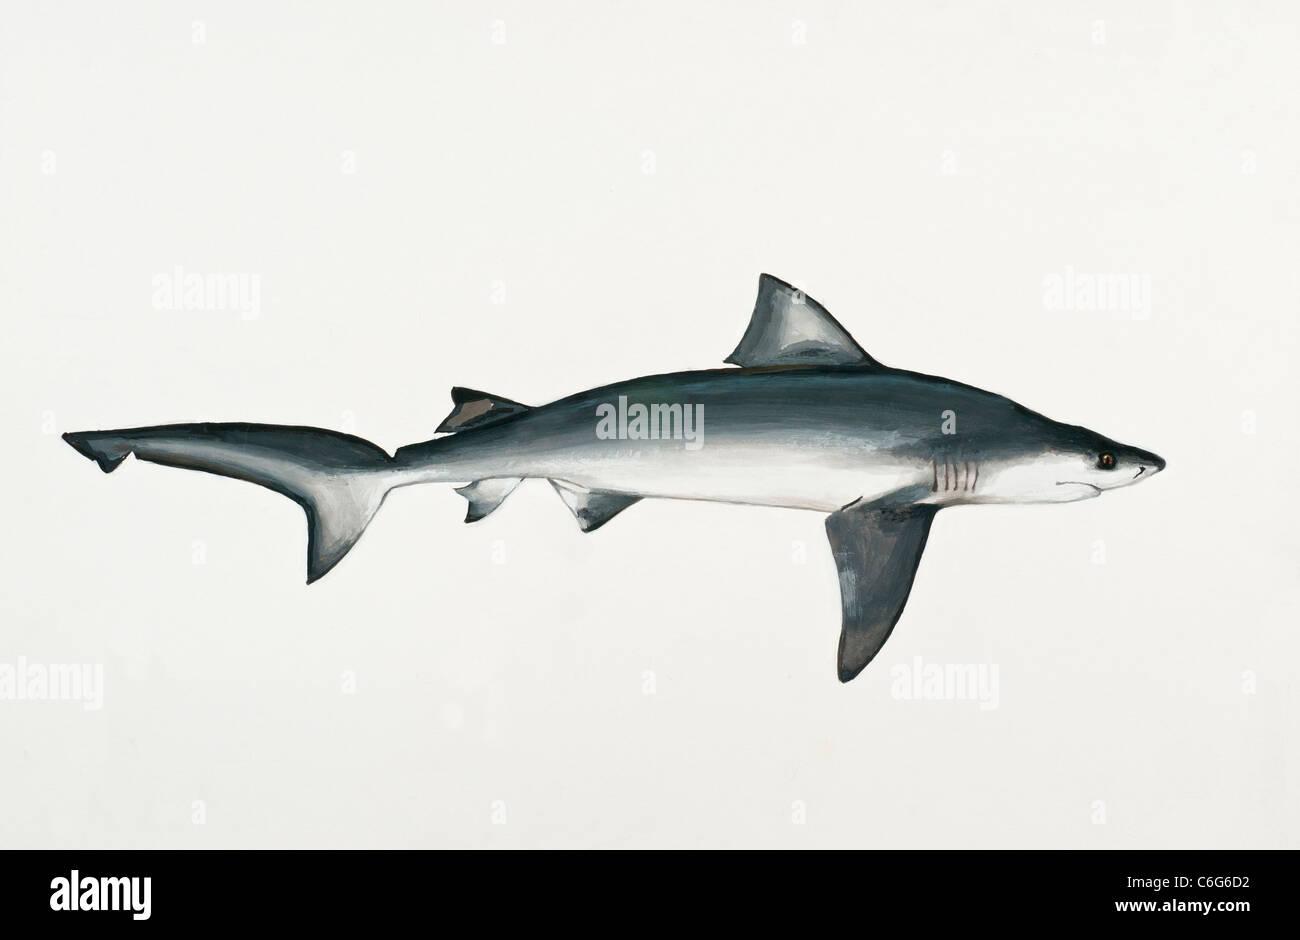 Bull Shark  Carcharhinus leucas, Carcharhinidae - Stock Image